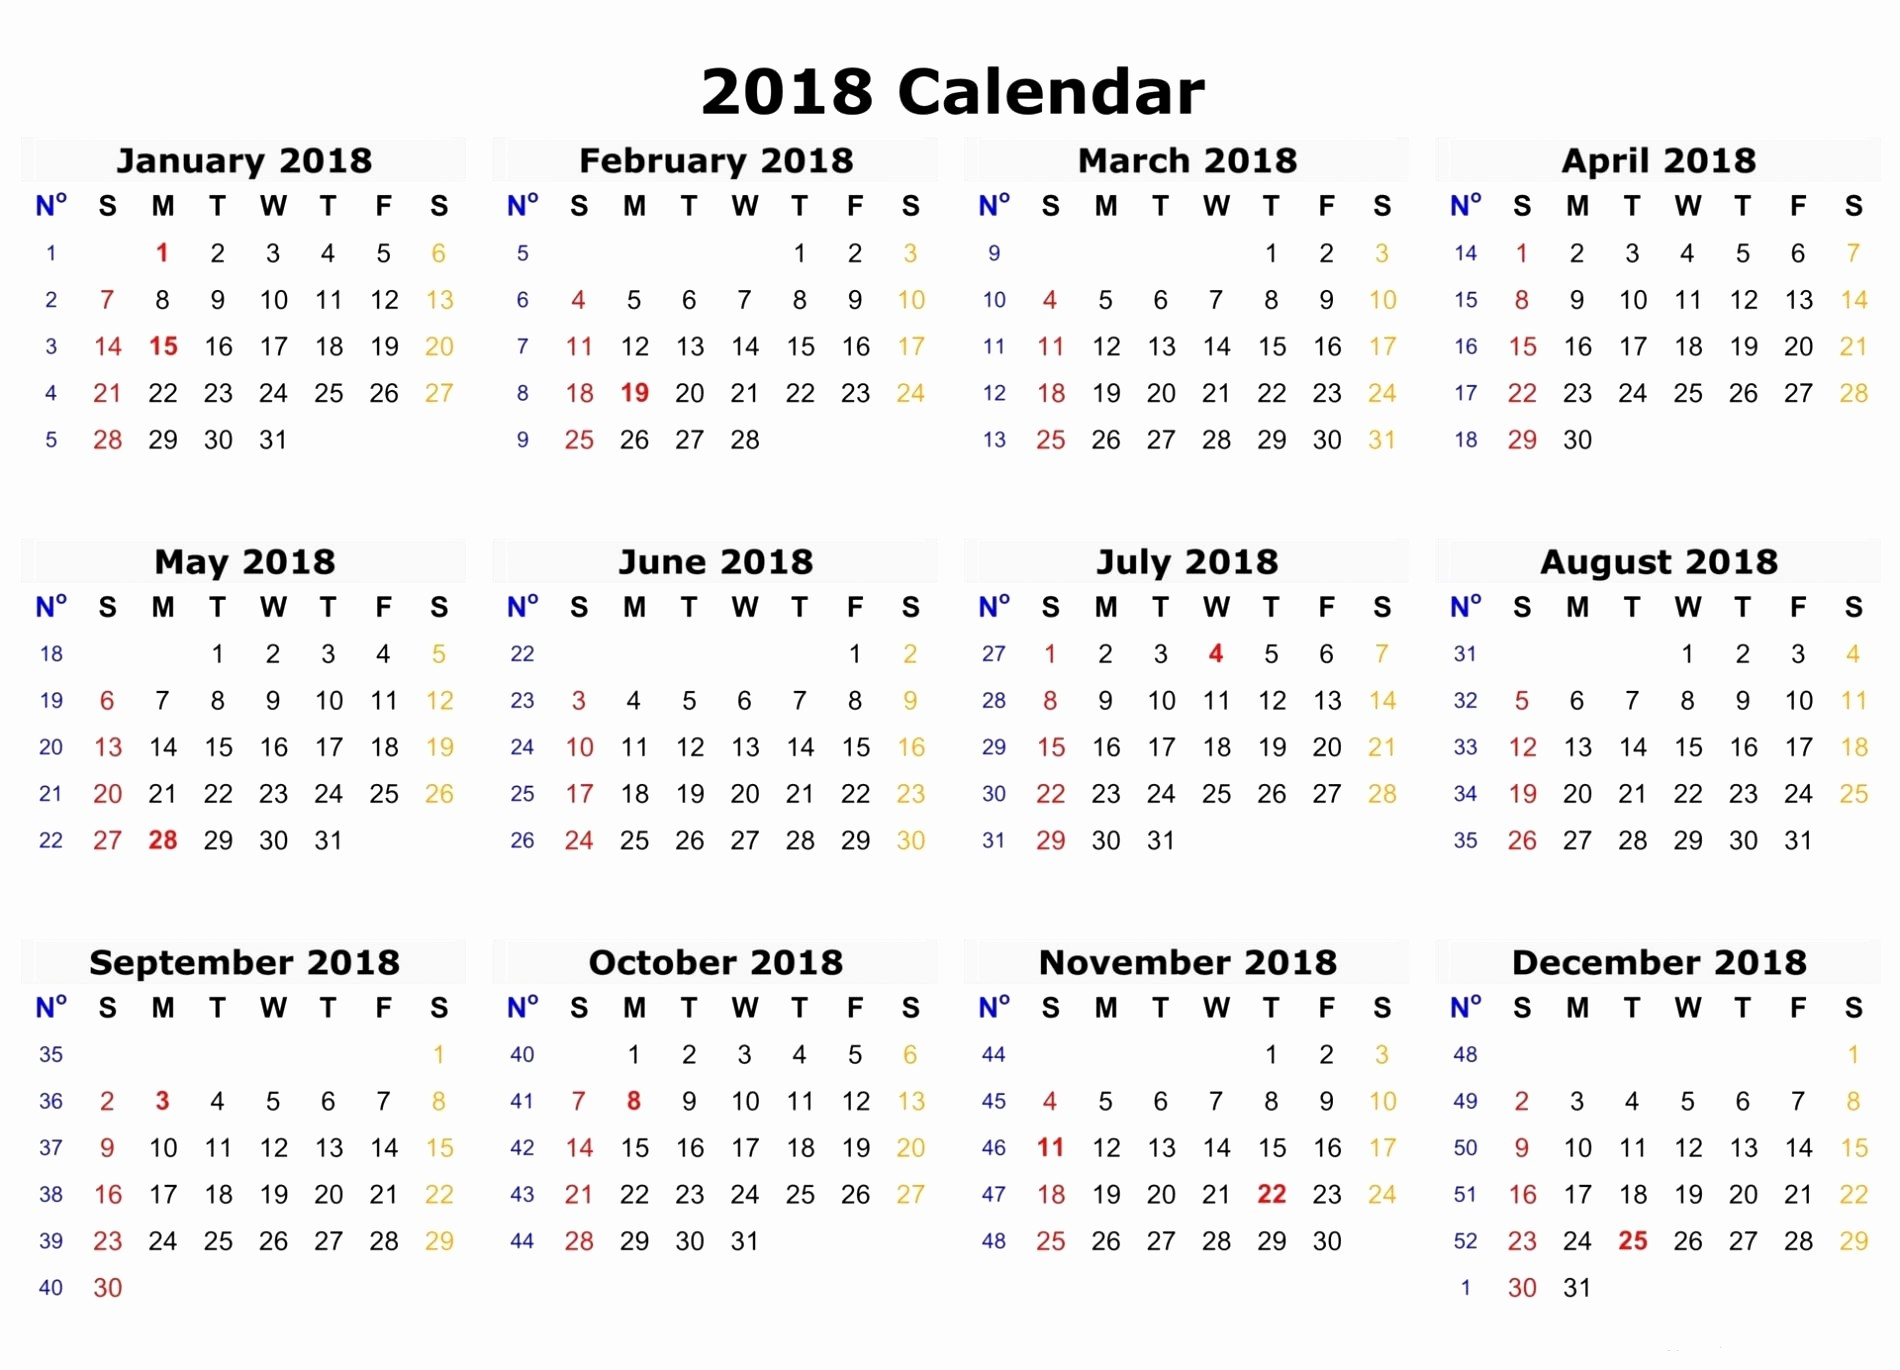 Monatskalender 2016 Excel Neu Kalender 2017 Excel Elegant 2017 Calendar Template Lovely Calendar